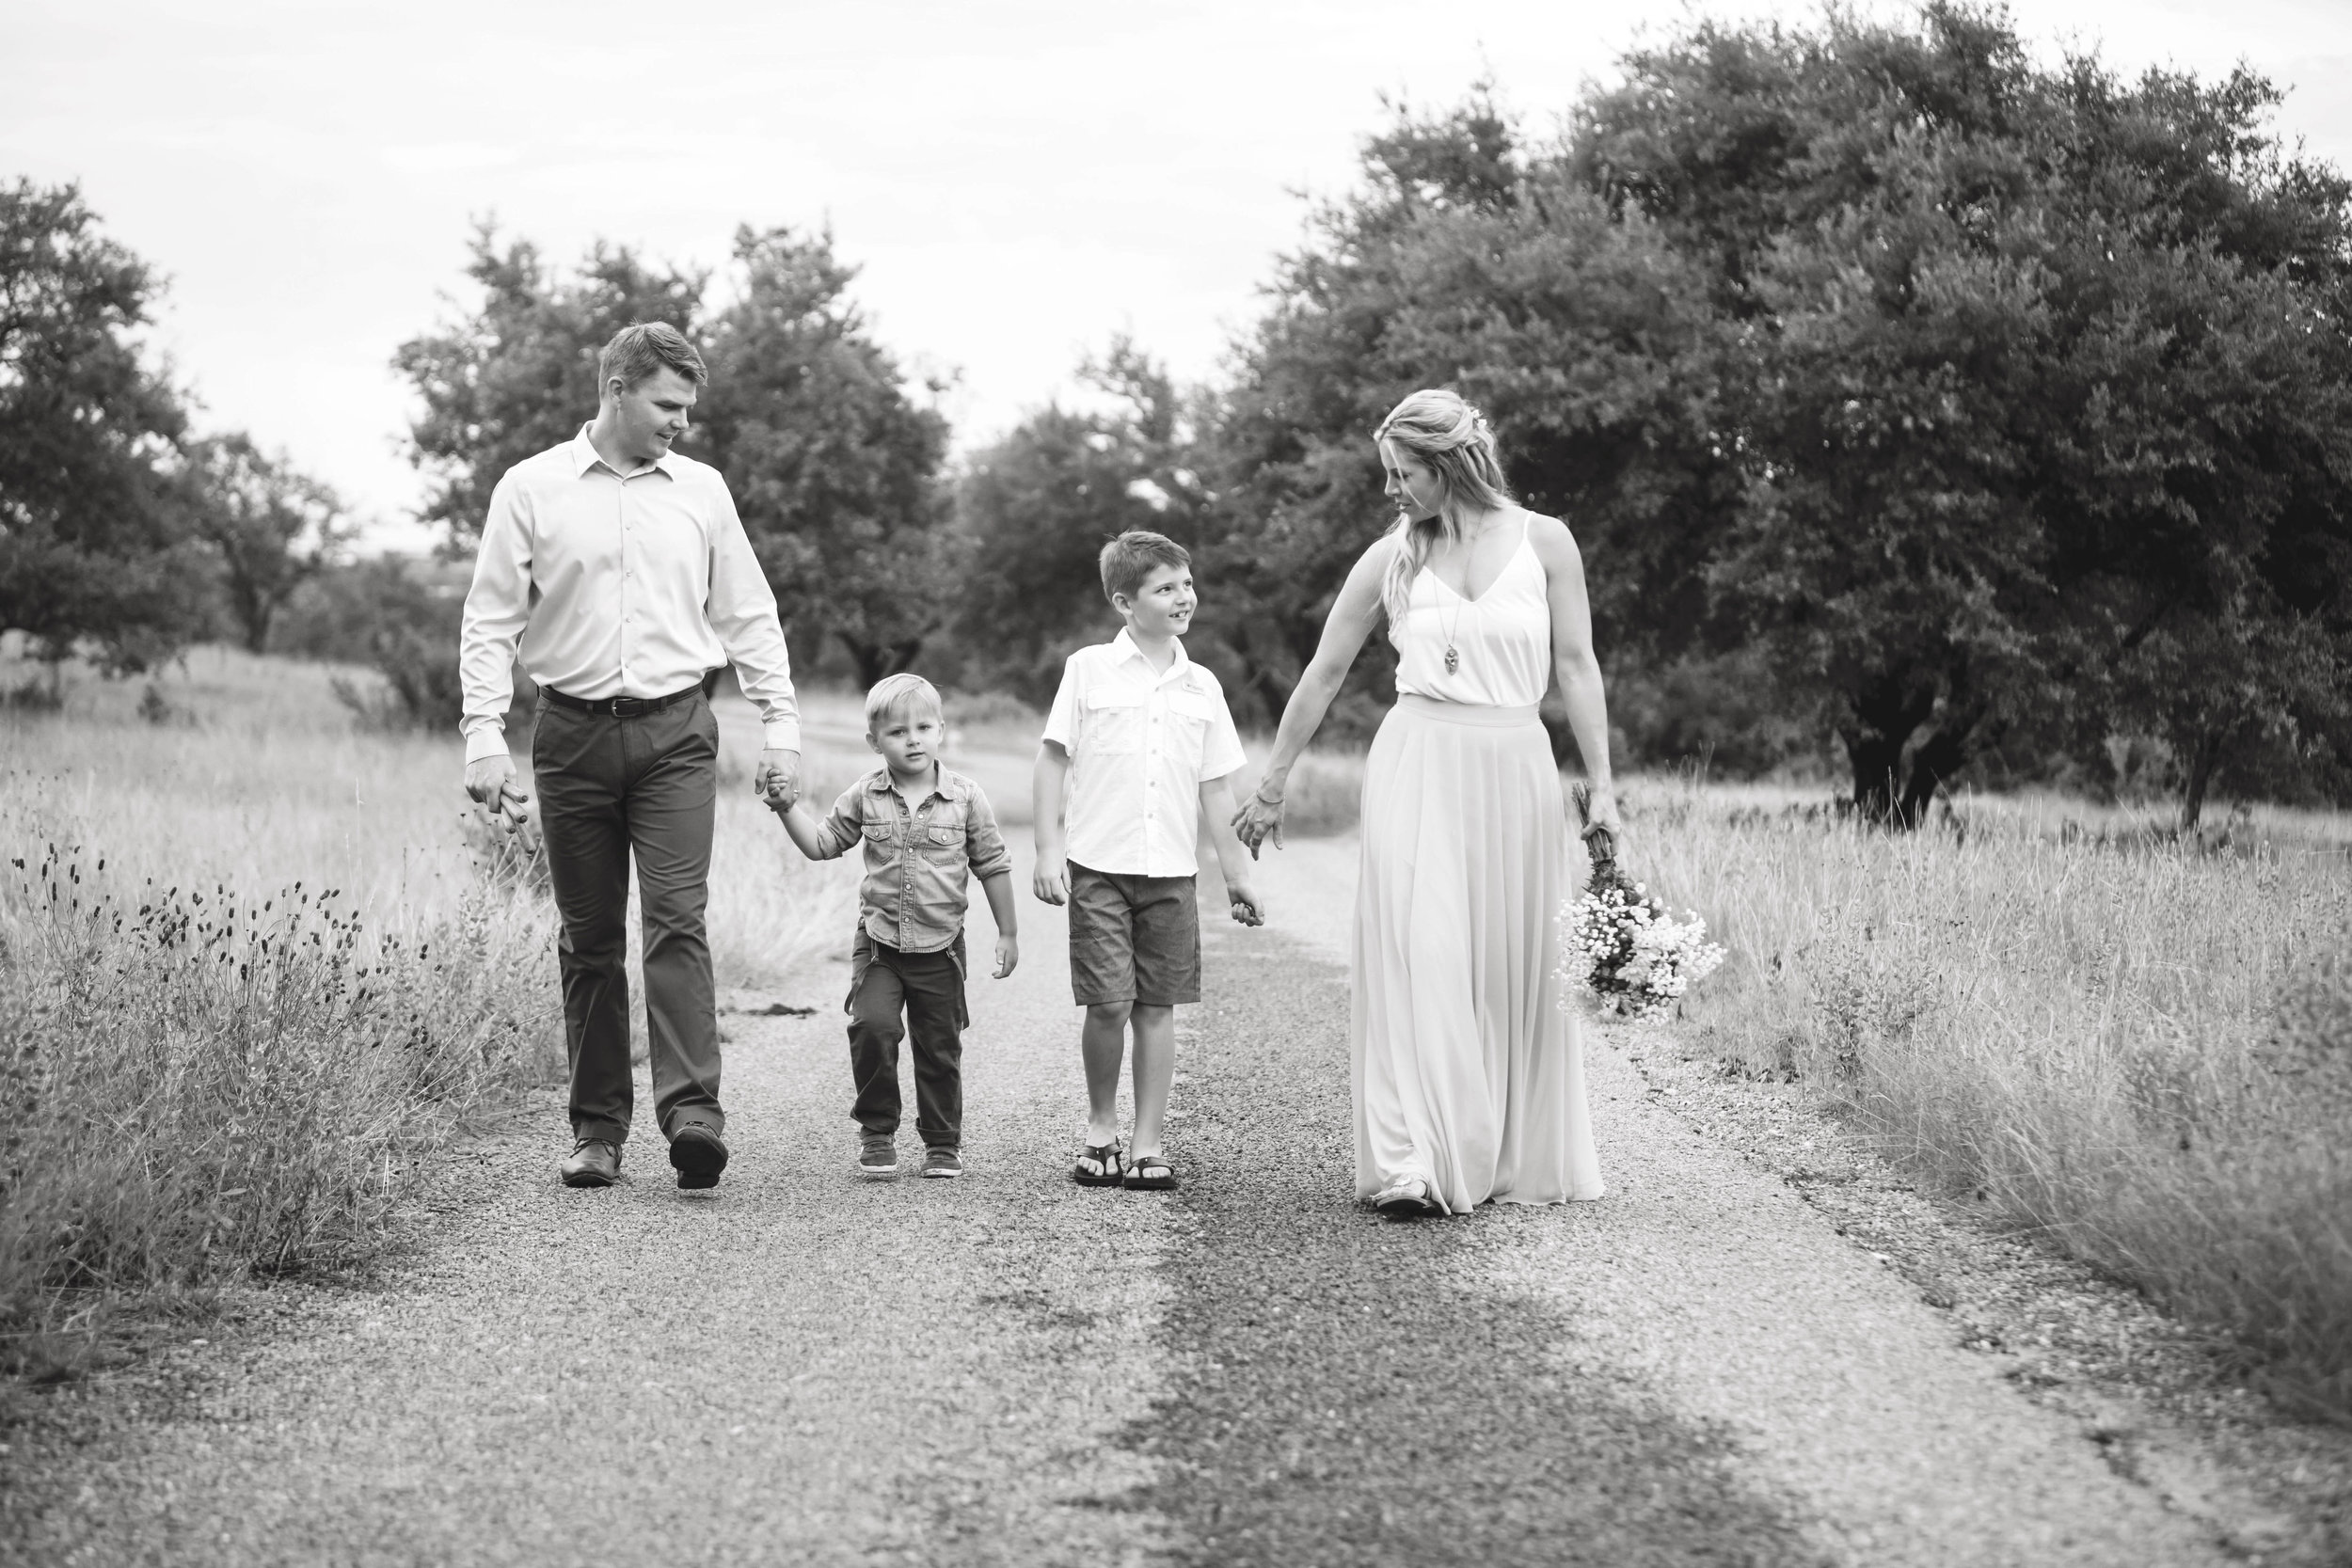 Marble_Falls_Milliorn_Family_Photographer_Jenna_Petty_01.jpg